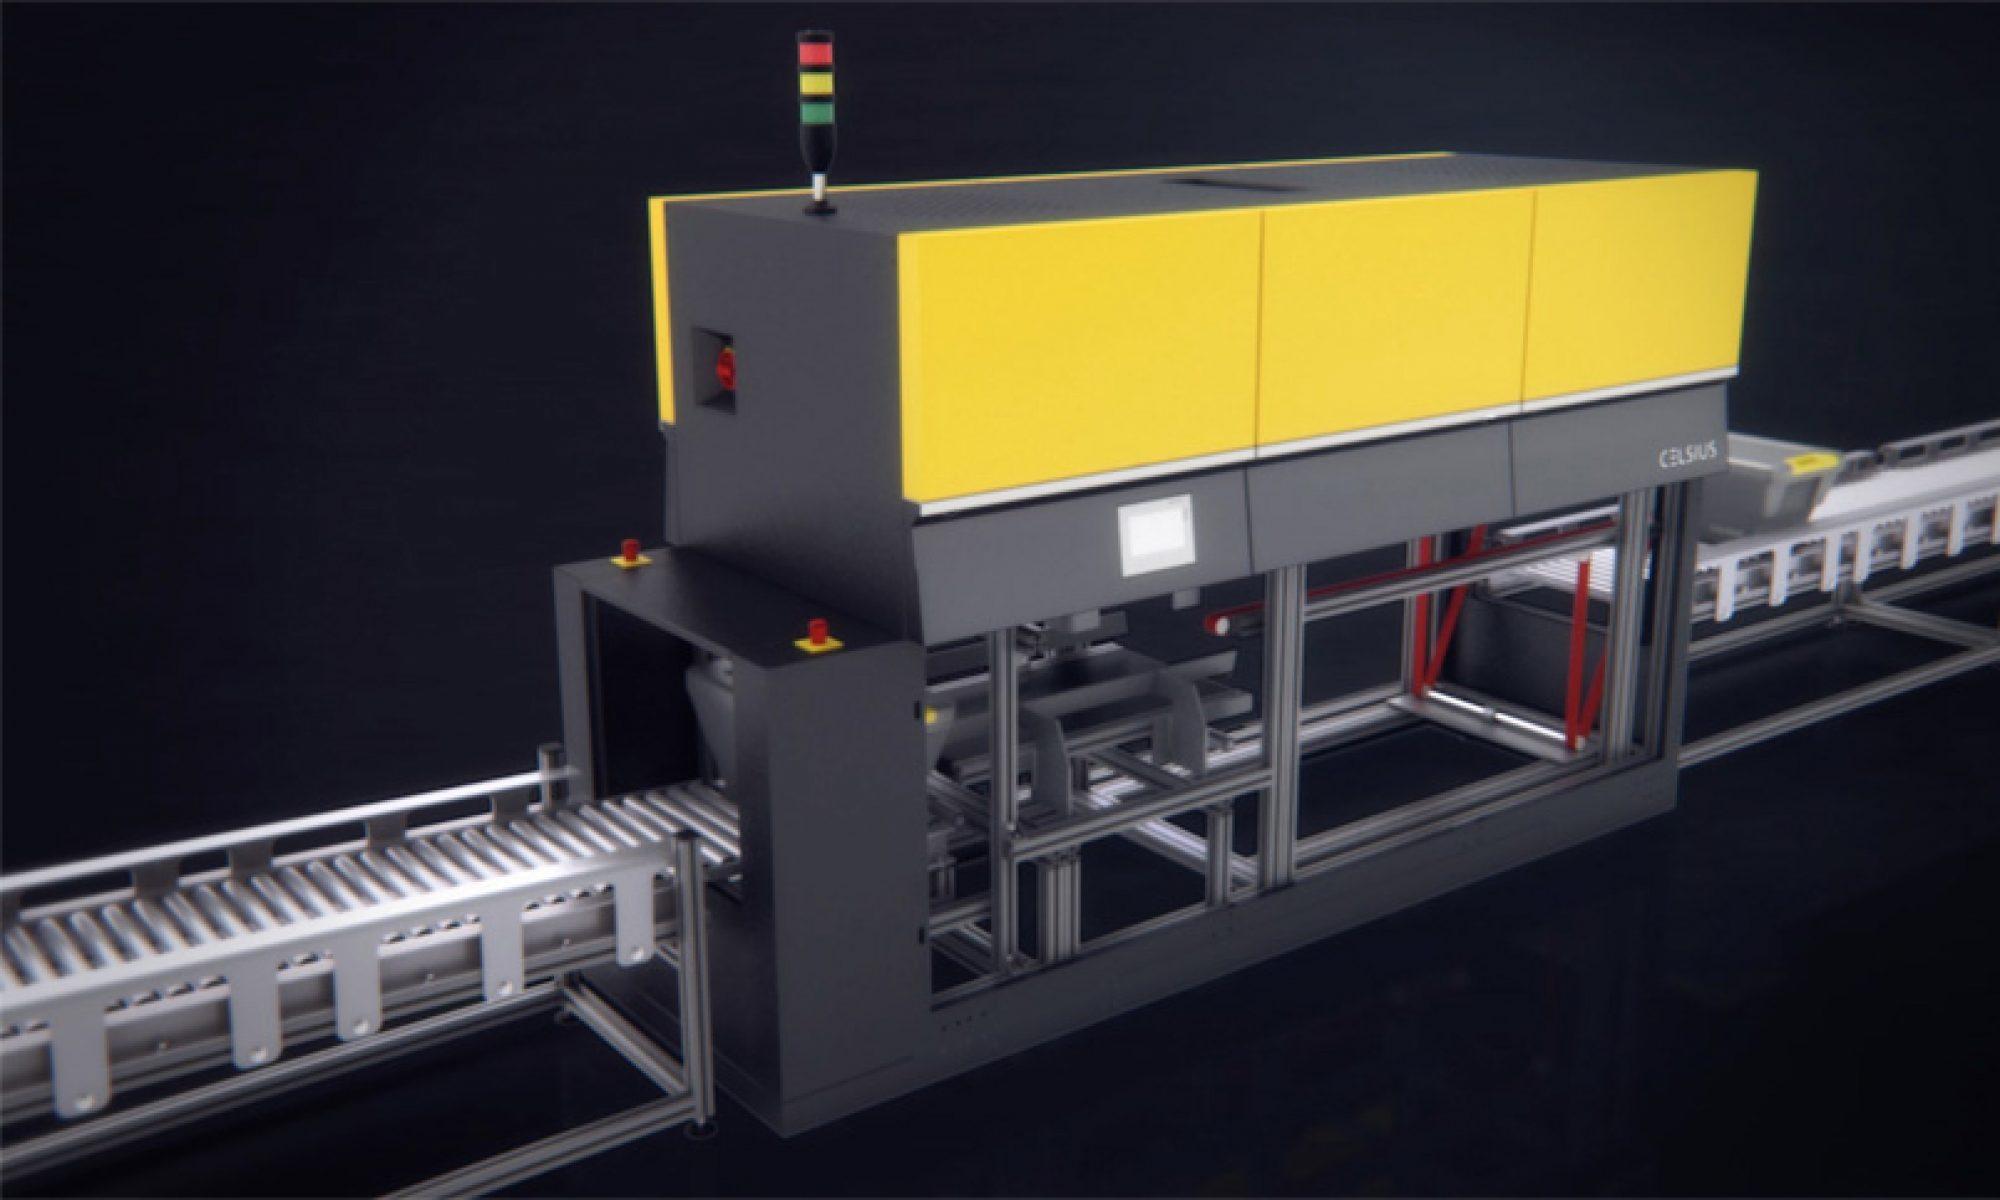 Celsius Entwicklung GmbH